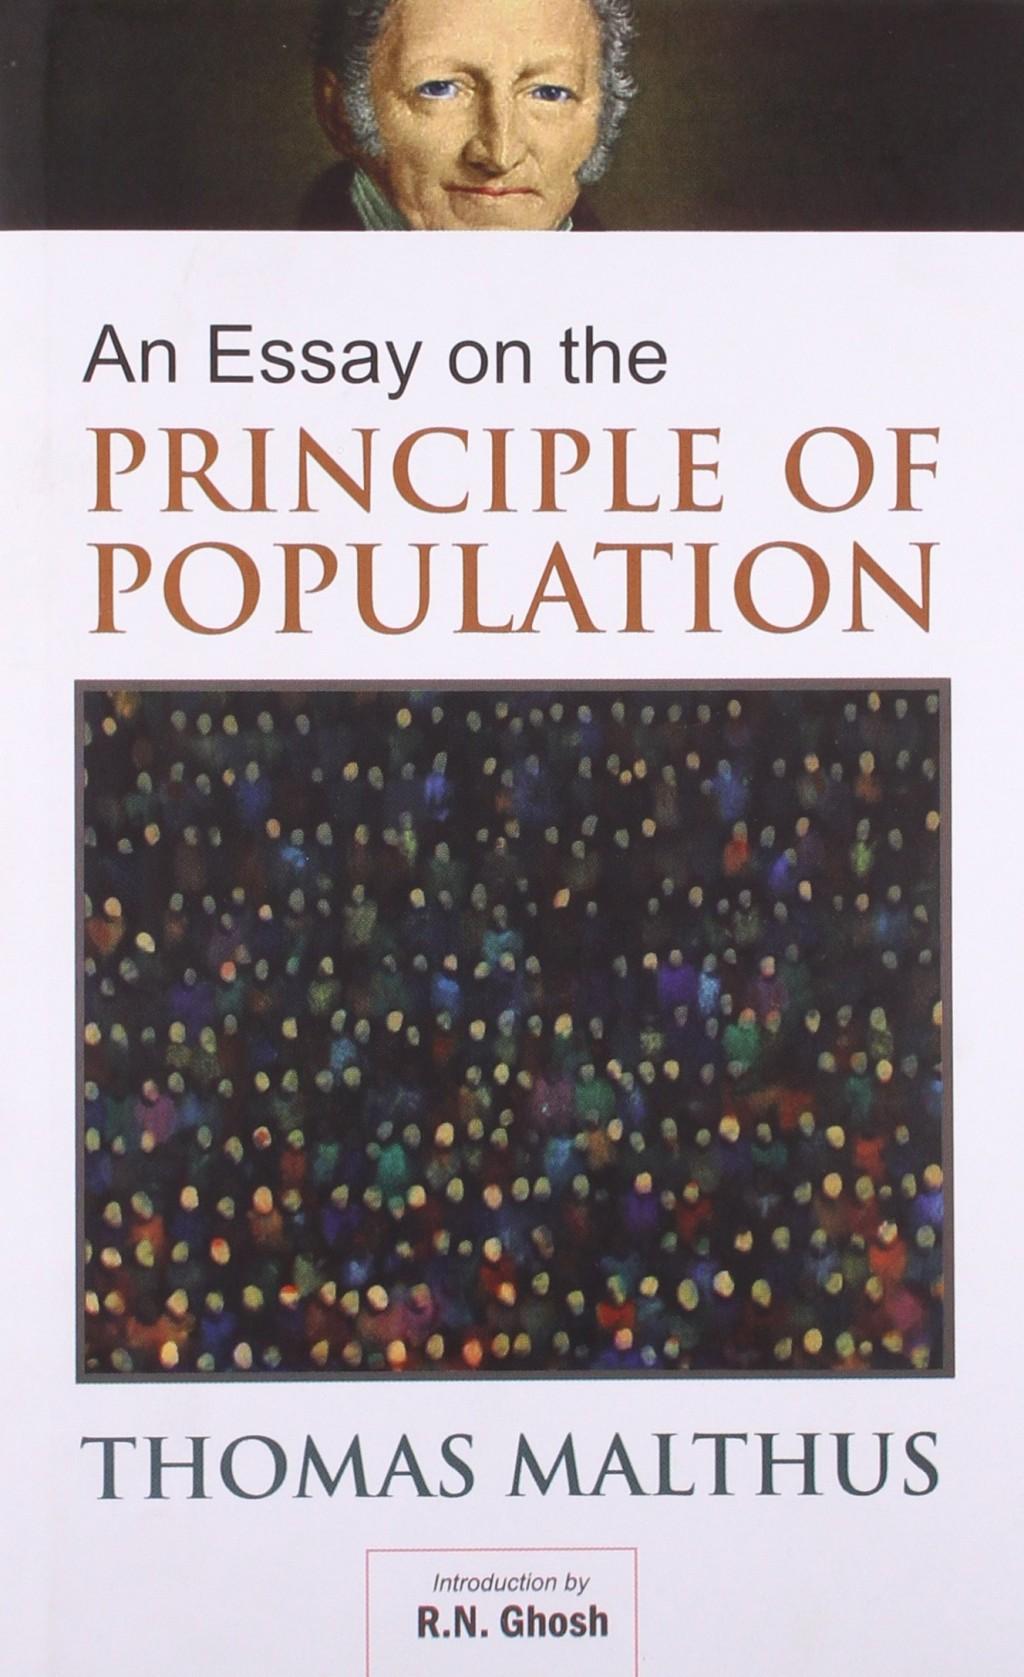 010 Thomas Malthus Essay On The Principle Of Population 8162bfm1ycfl Stupendous After Reading Malthus's Principles Darwin Got Idea That Ap Euro Large